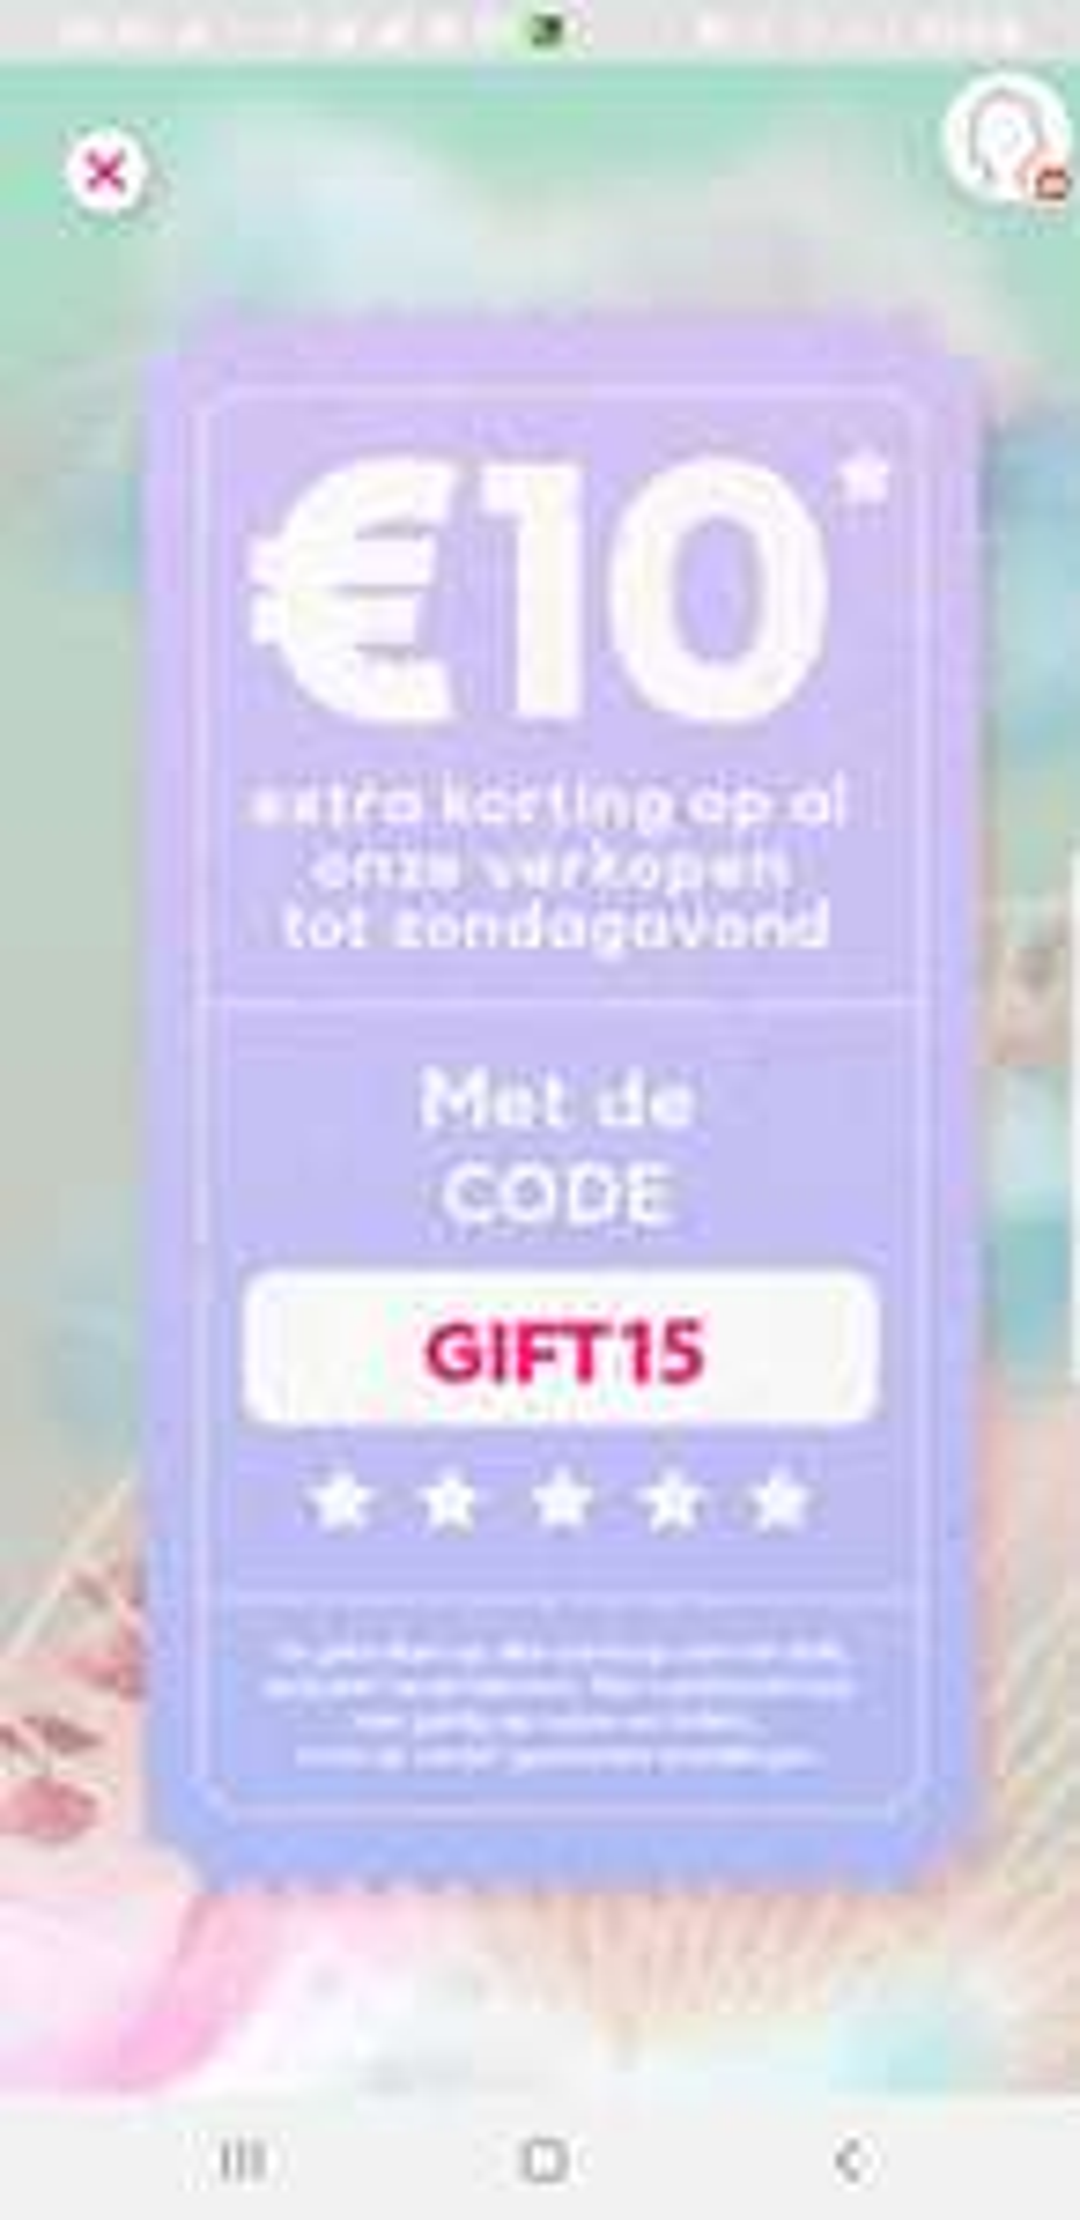 [prijsfout] Veepee extra korting €10